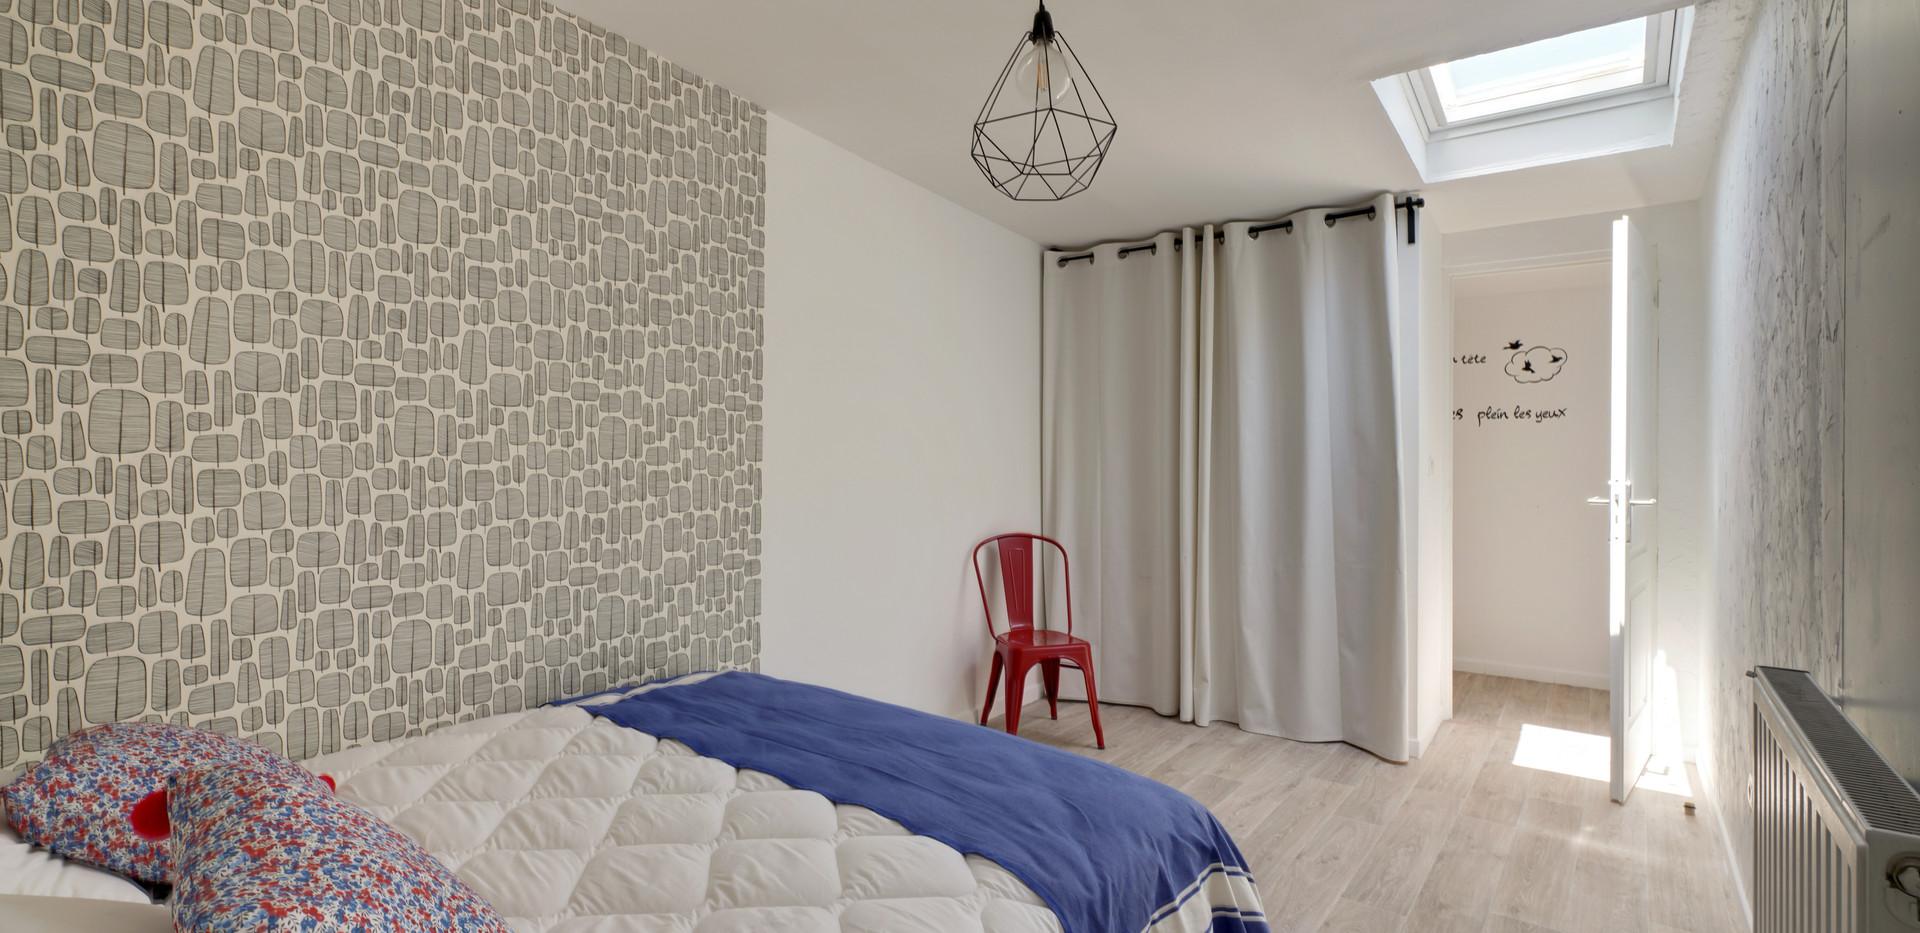 Maison des Amis, Mas Saint-Gens, holidays rental